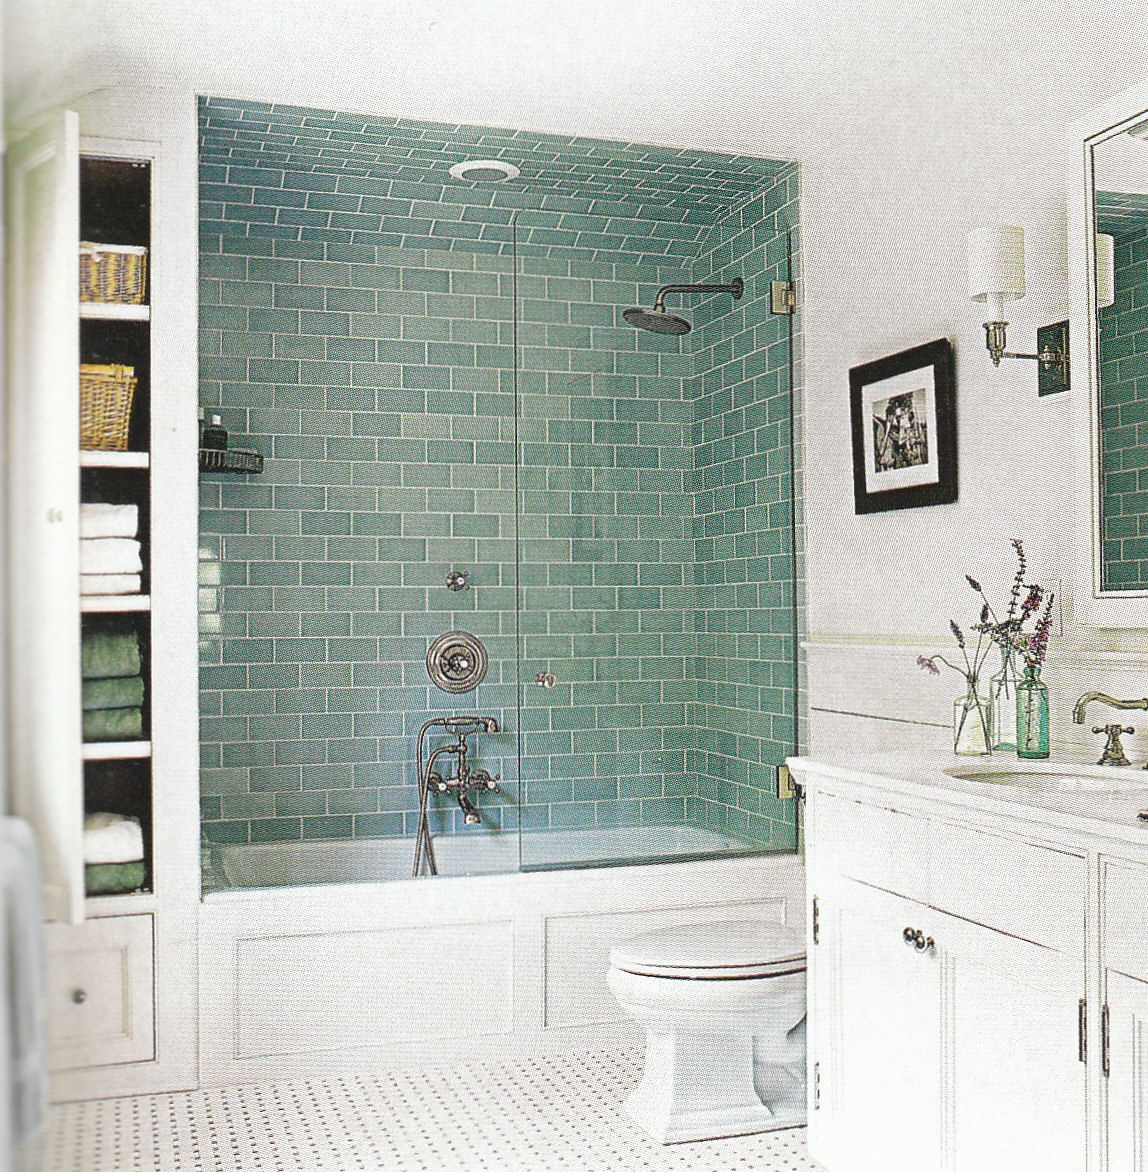 Stunning Bathtub Shower Combo Lowes  Bathroom  Pinterest Beauteous Lowes Bathroom Tile Designs Design Inspiration